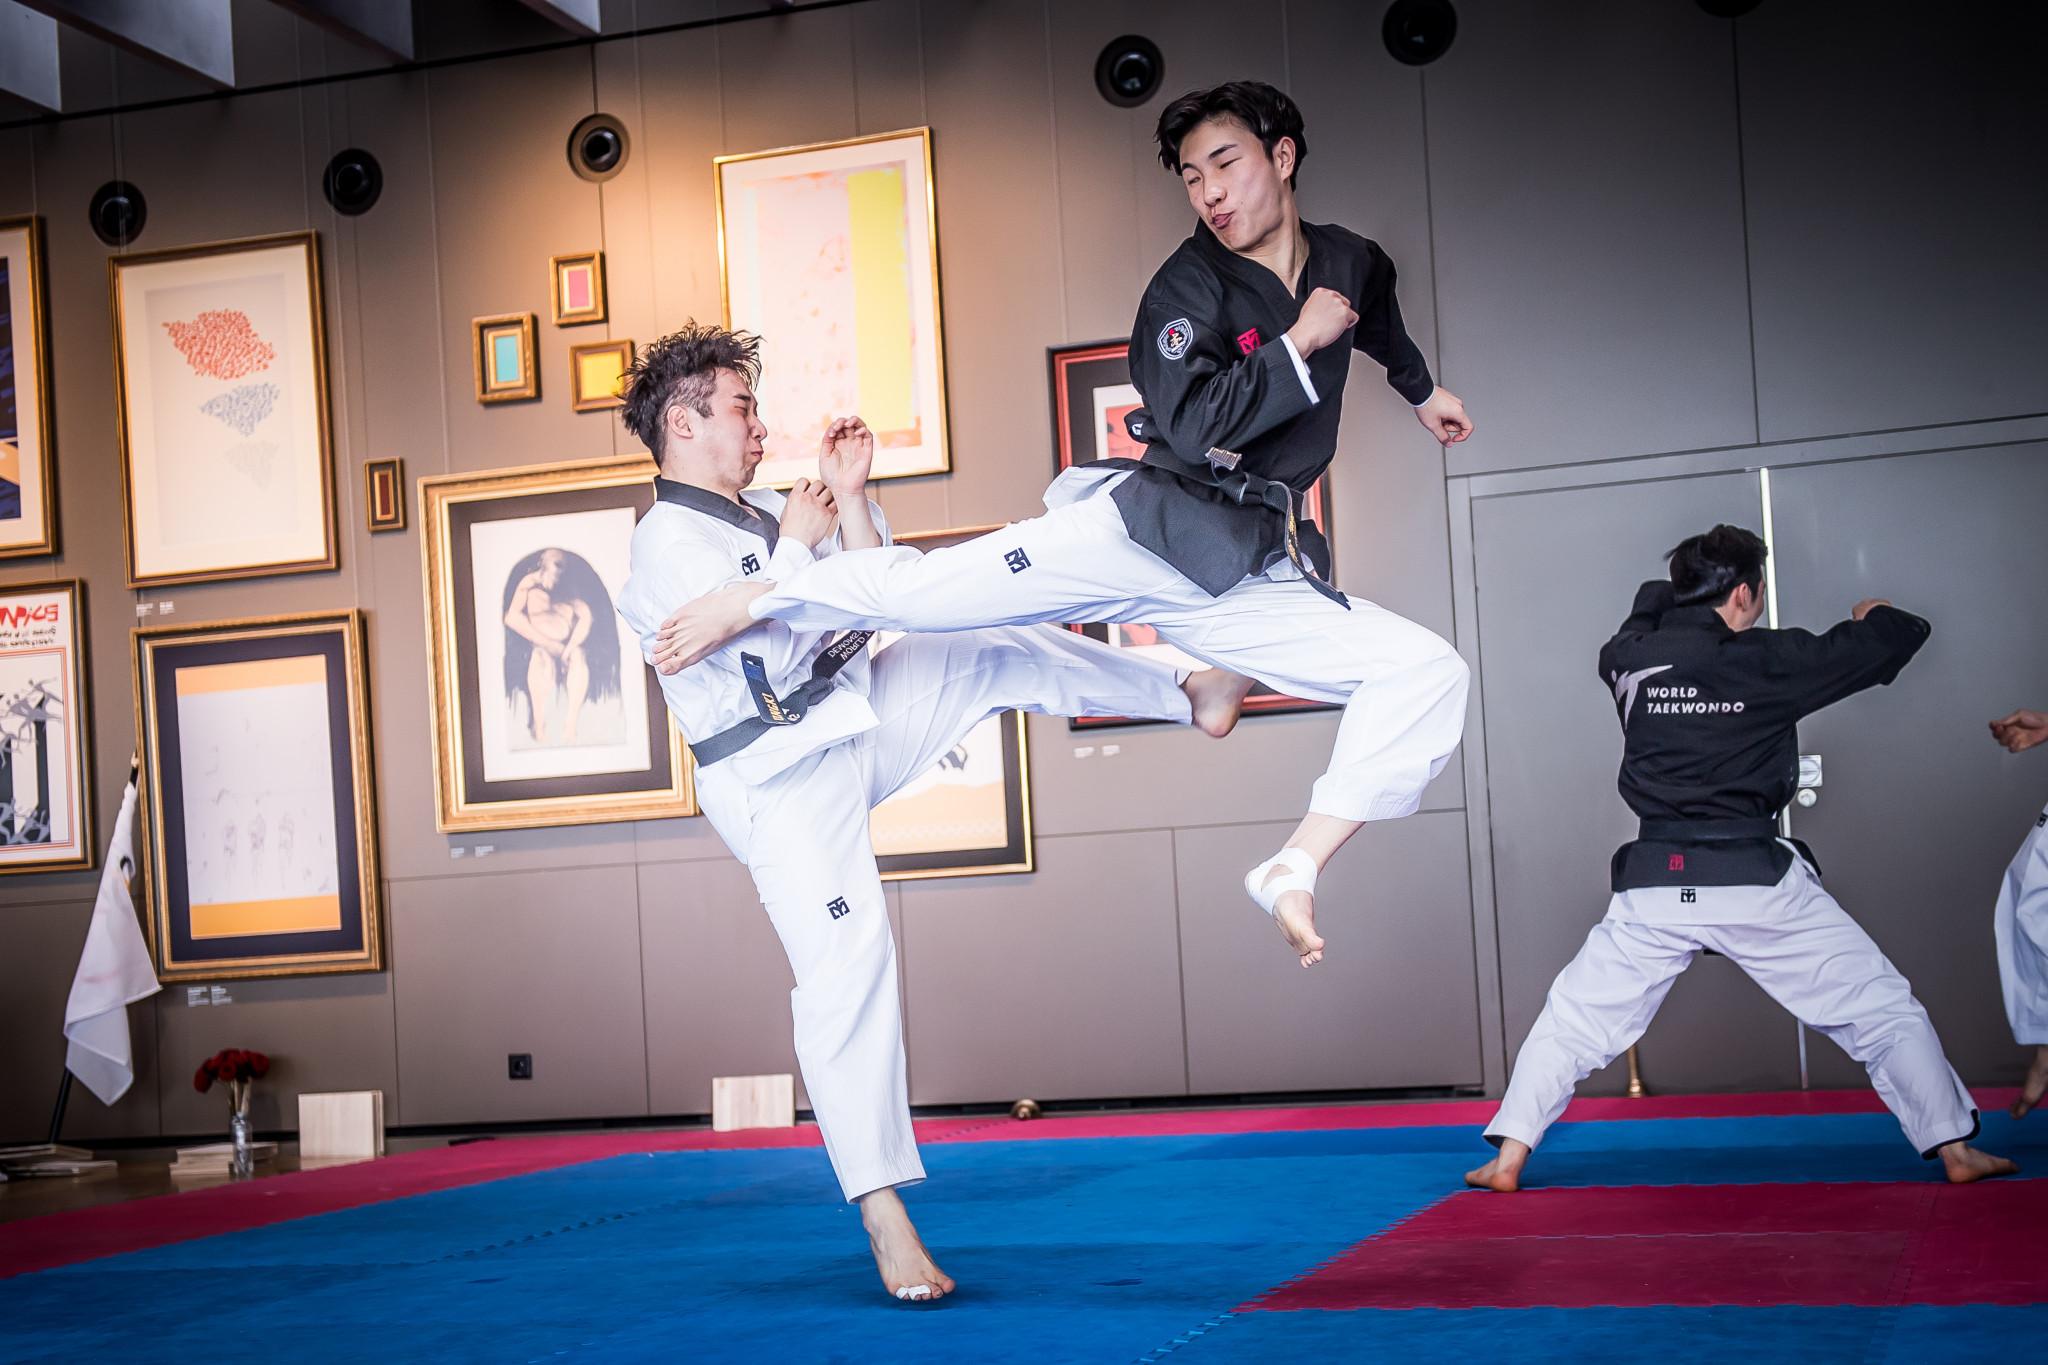 The team from World Taekwondo took to the floor next ©World Taekwondo